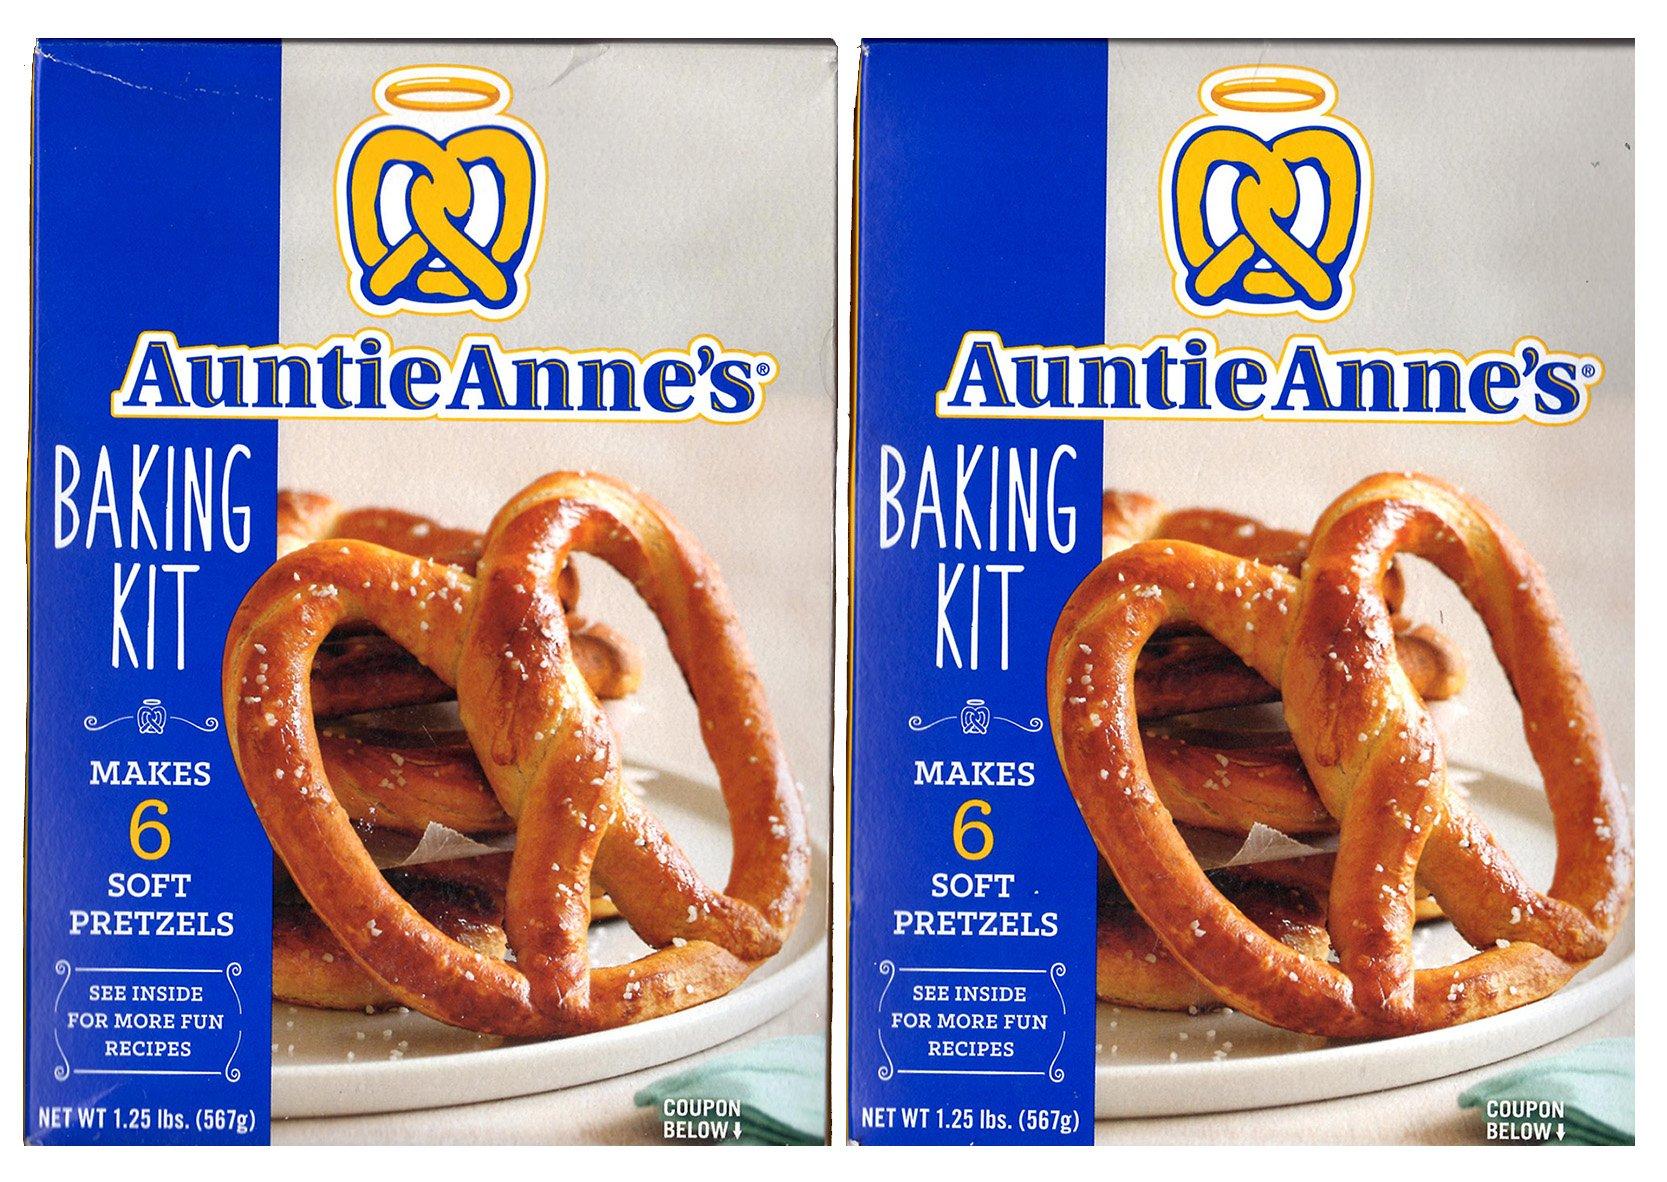 Auntie Annes, Make Your Own Pretzel Kit, 1.25 Pound Kit (Pack of 2)